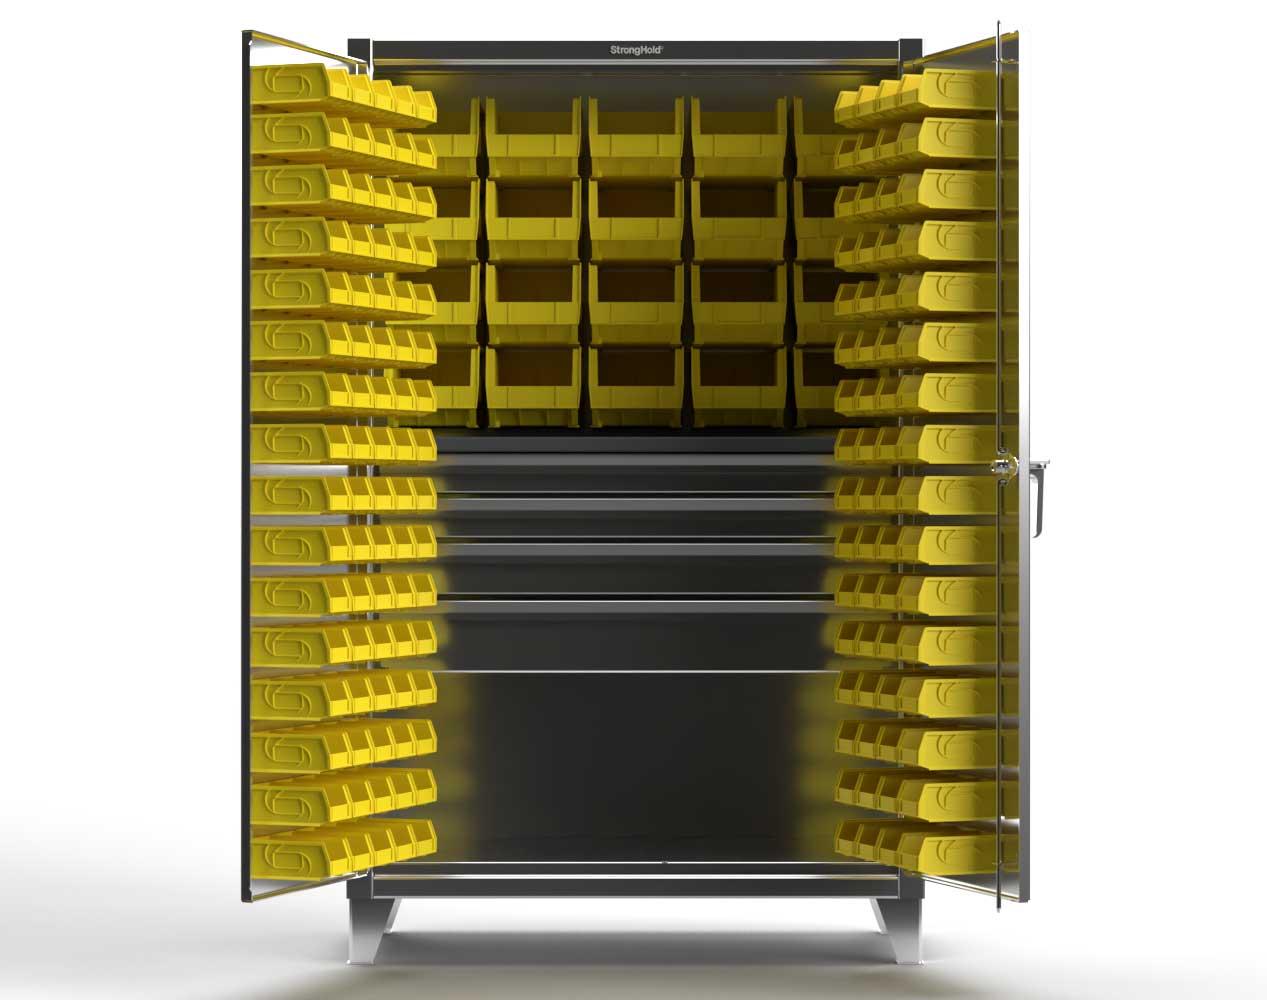 Extra Heavy Duty 12 GA Stainless Steel Bin Cabinet with 4 Drawers, 1 Shelf – 36 In. W x 24 In. D x 78 In. H